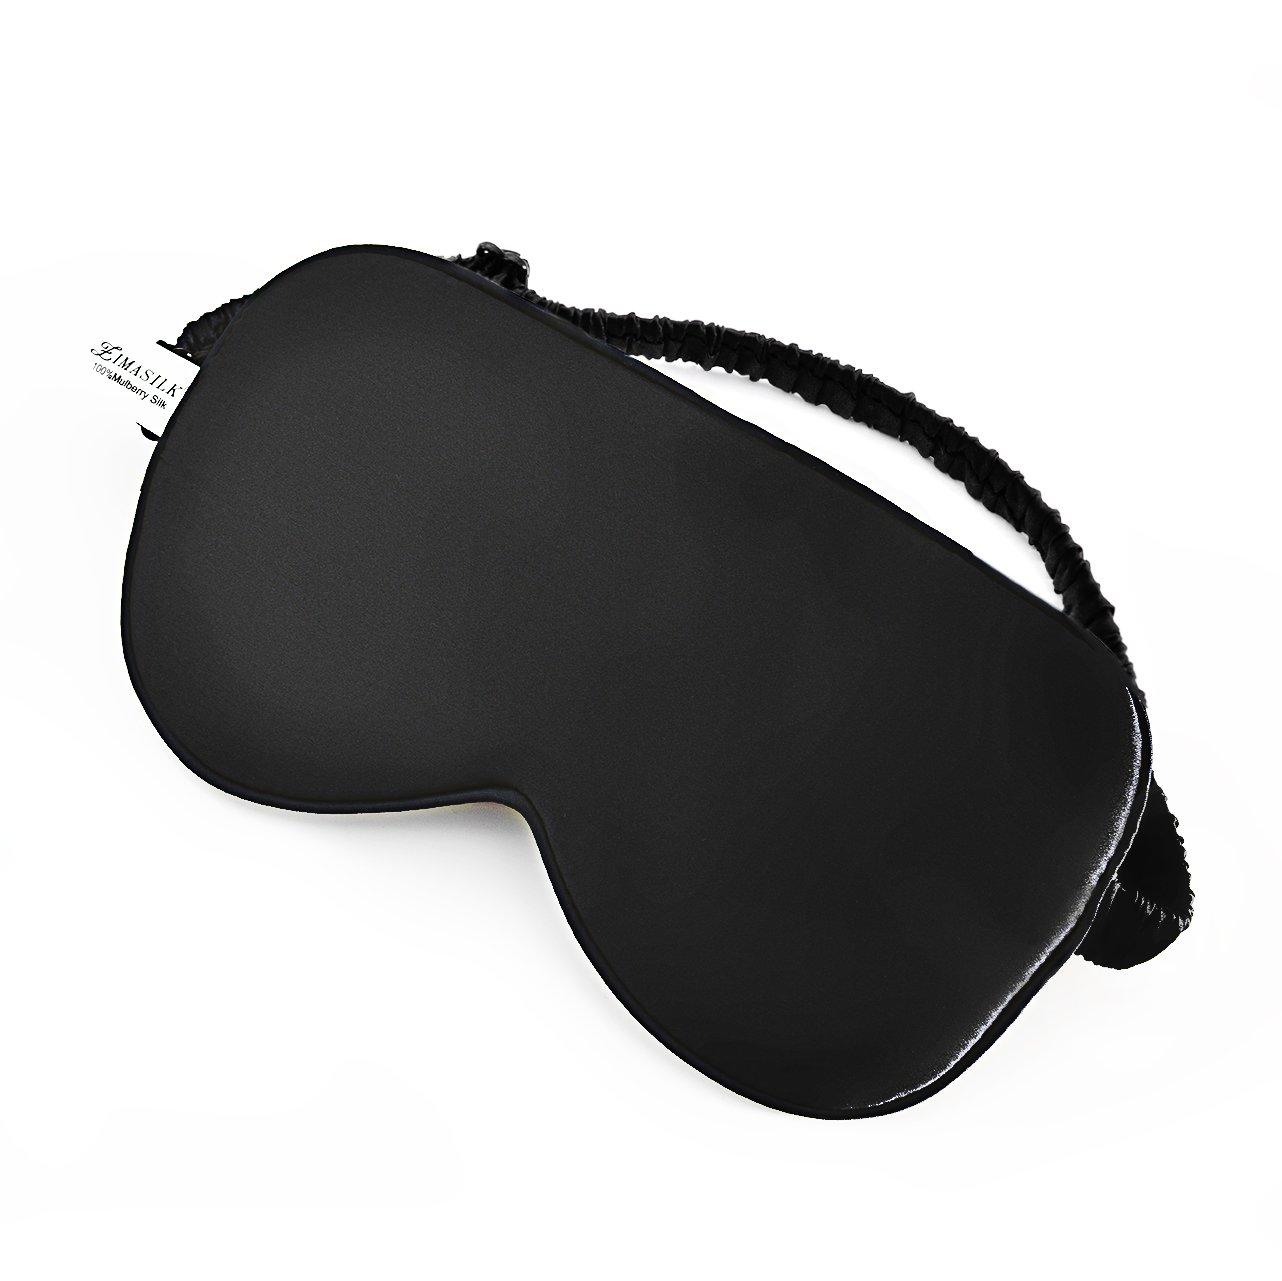 ZIMASILK 100% Natural Silk Sleep Mask ,Silk Cover Elastic Headband Adjustable,Super-Smooth Soft Eye Mask for Sleep (Black I)